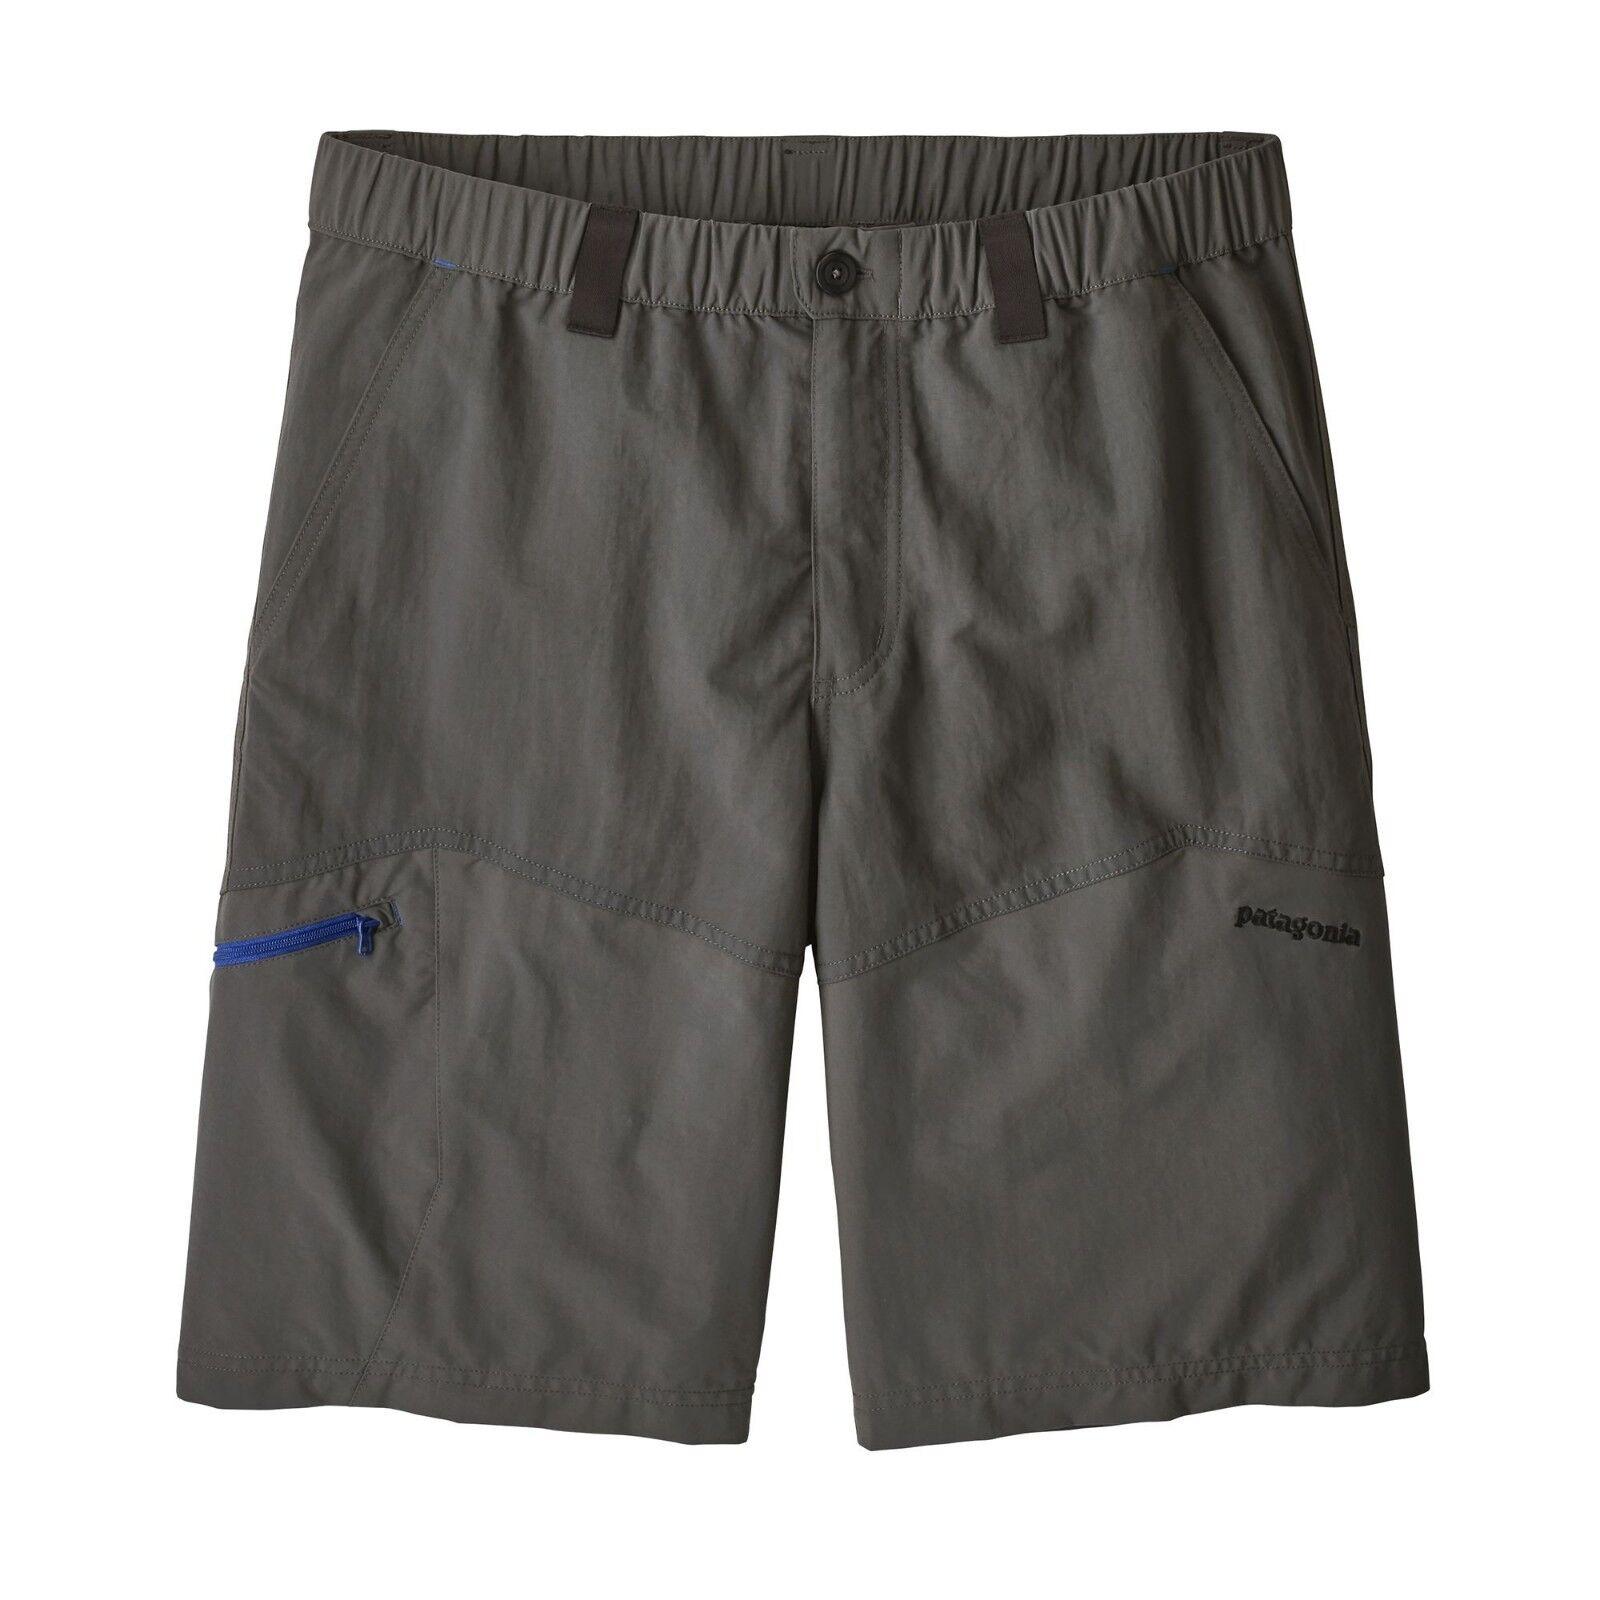 Patagonia Men's Guidewater II Shorts - 10  - FGE - Forge Grey - 50+ UPF